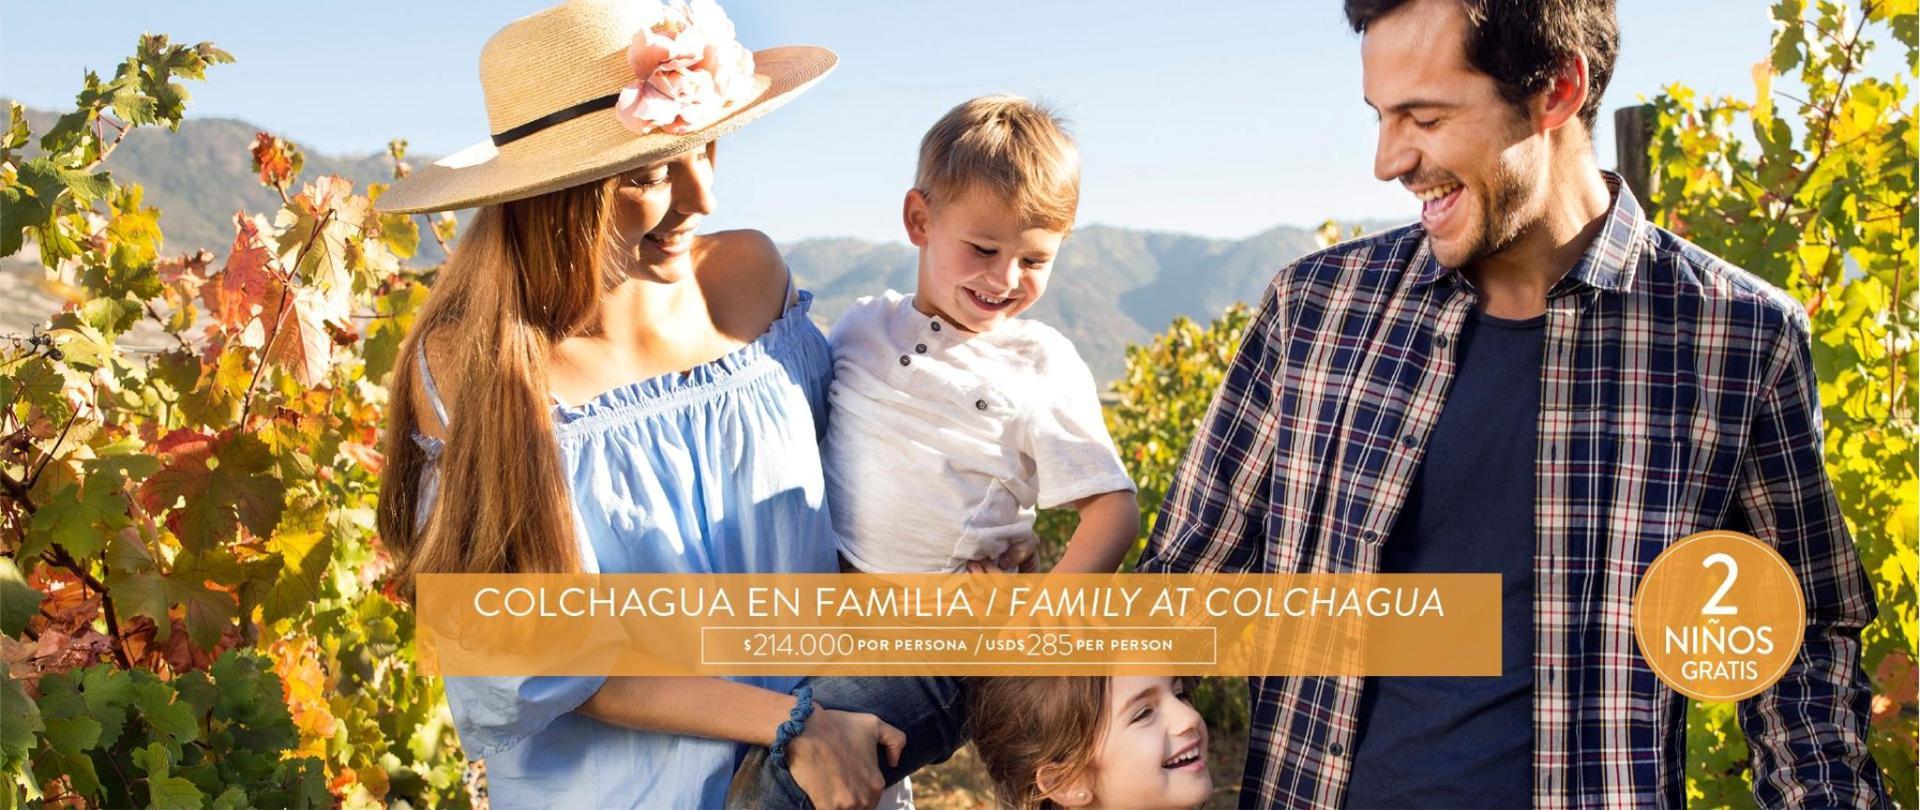 Colchagua en Familia banner 2018.jpg